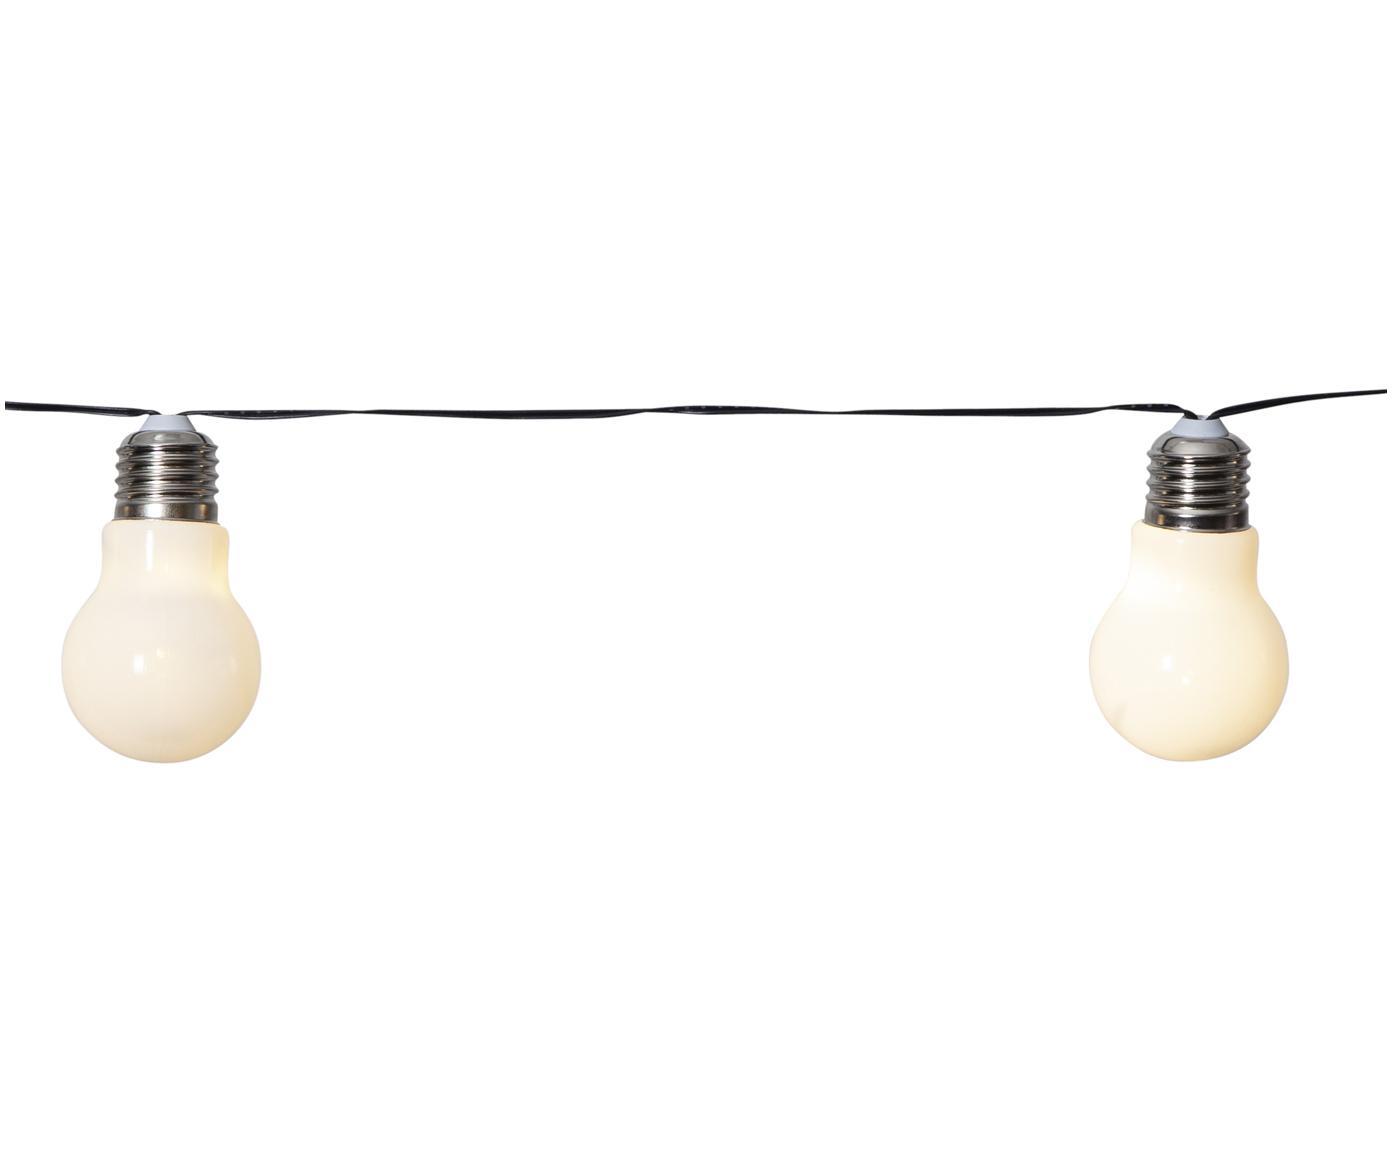 LED Lichterkette Glow, 100 cm, Weiss, L 100 cm